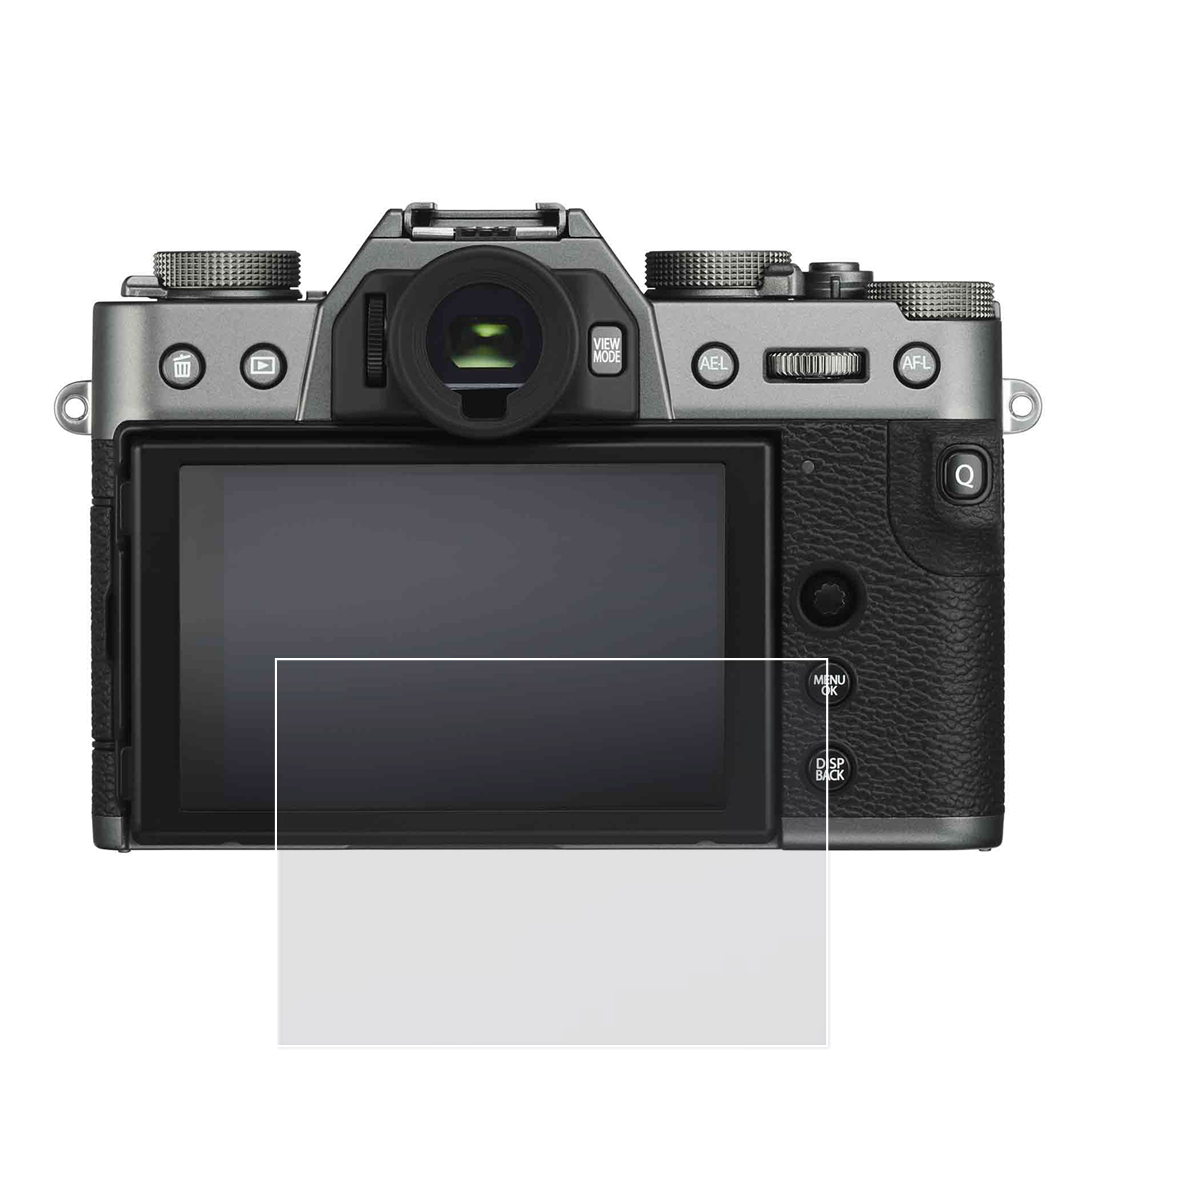 Lcd-Screen-Protector Fujifilm X-S10 X-T30 X-T100 X-E3 Camera for Fuji/X-s10/X-t30/..